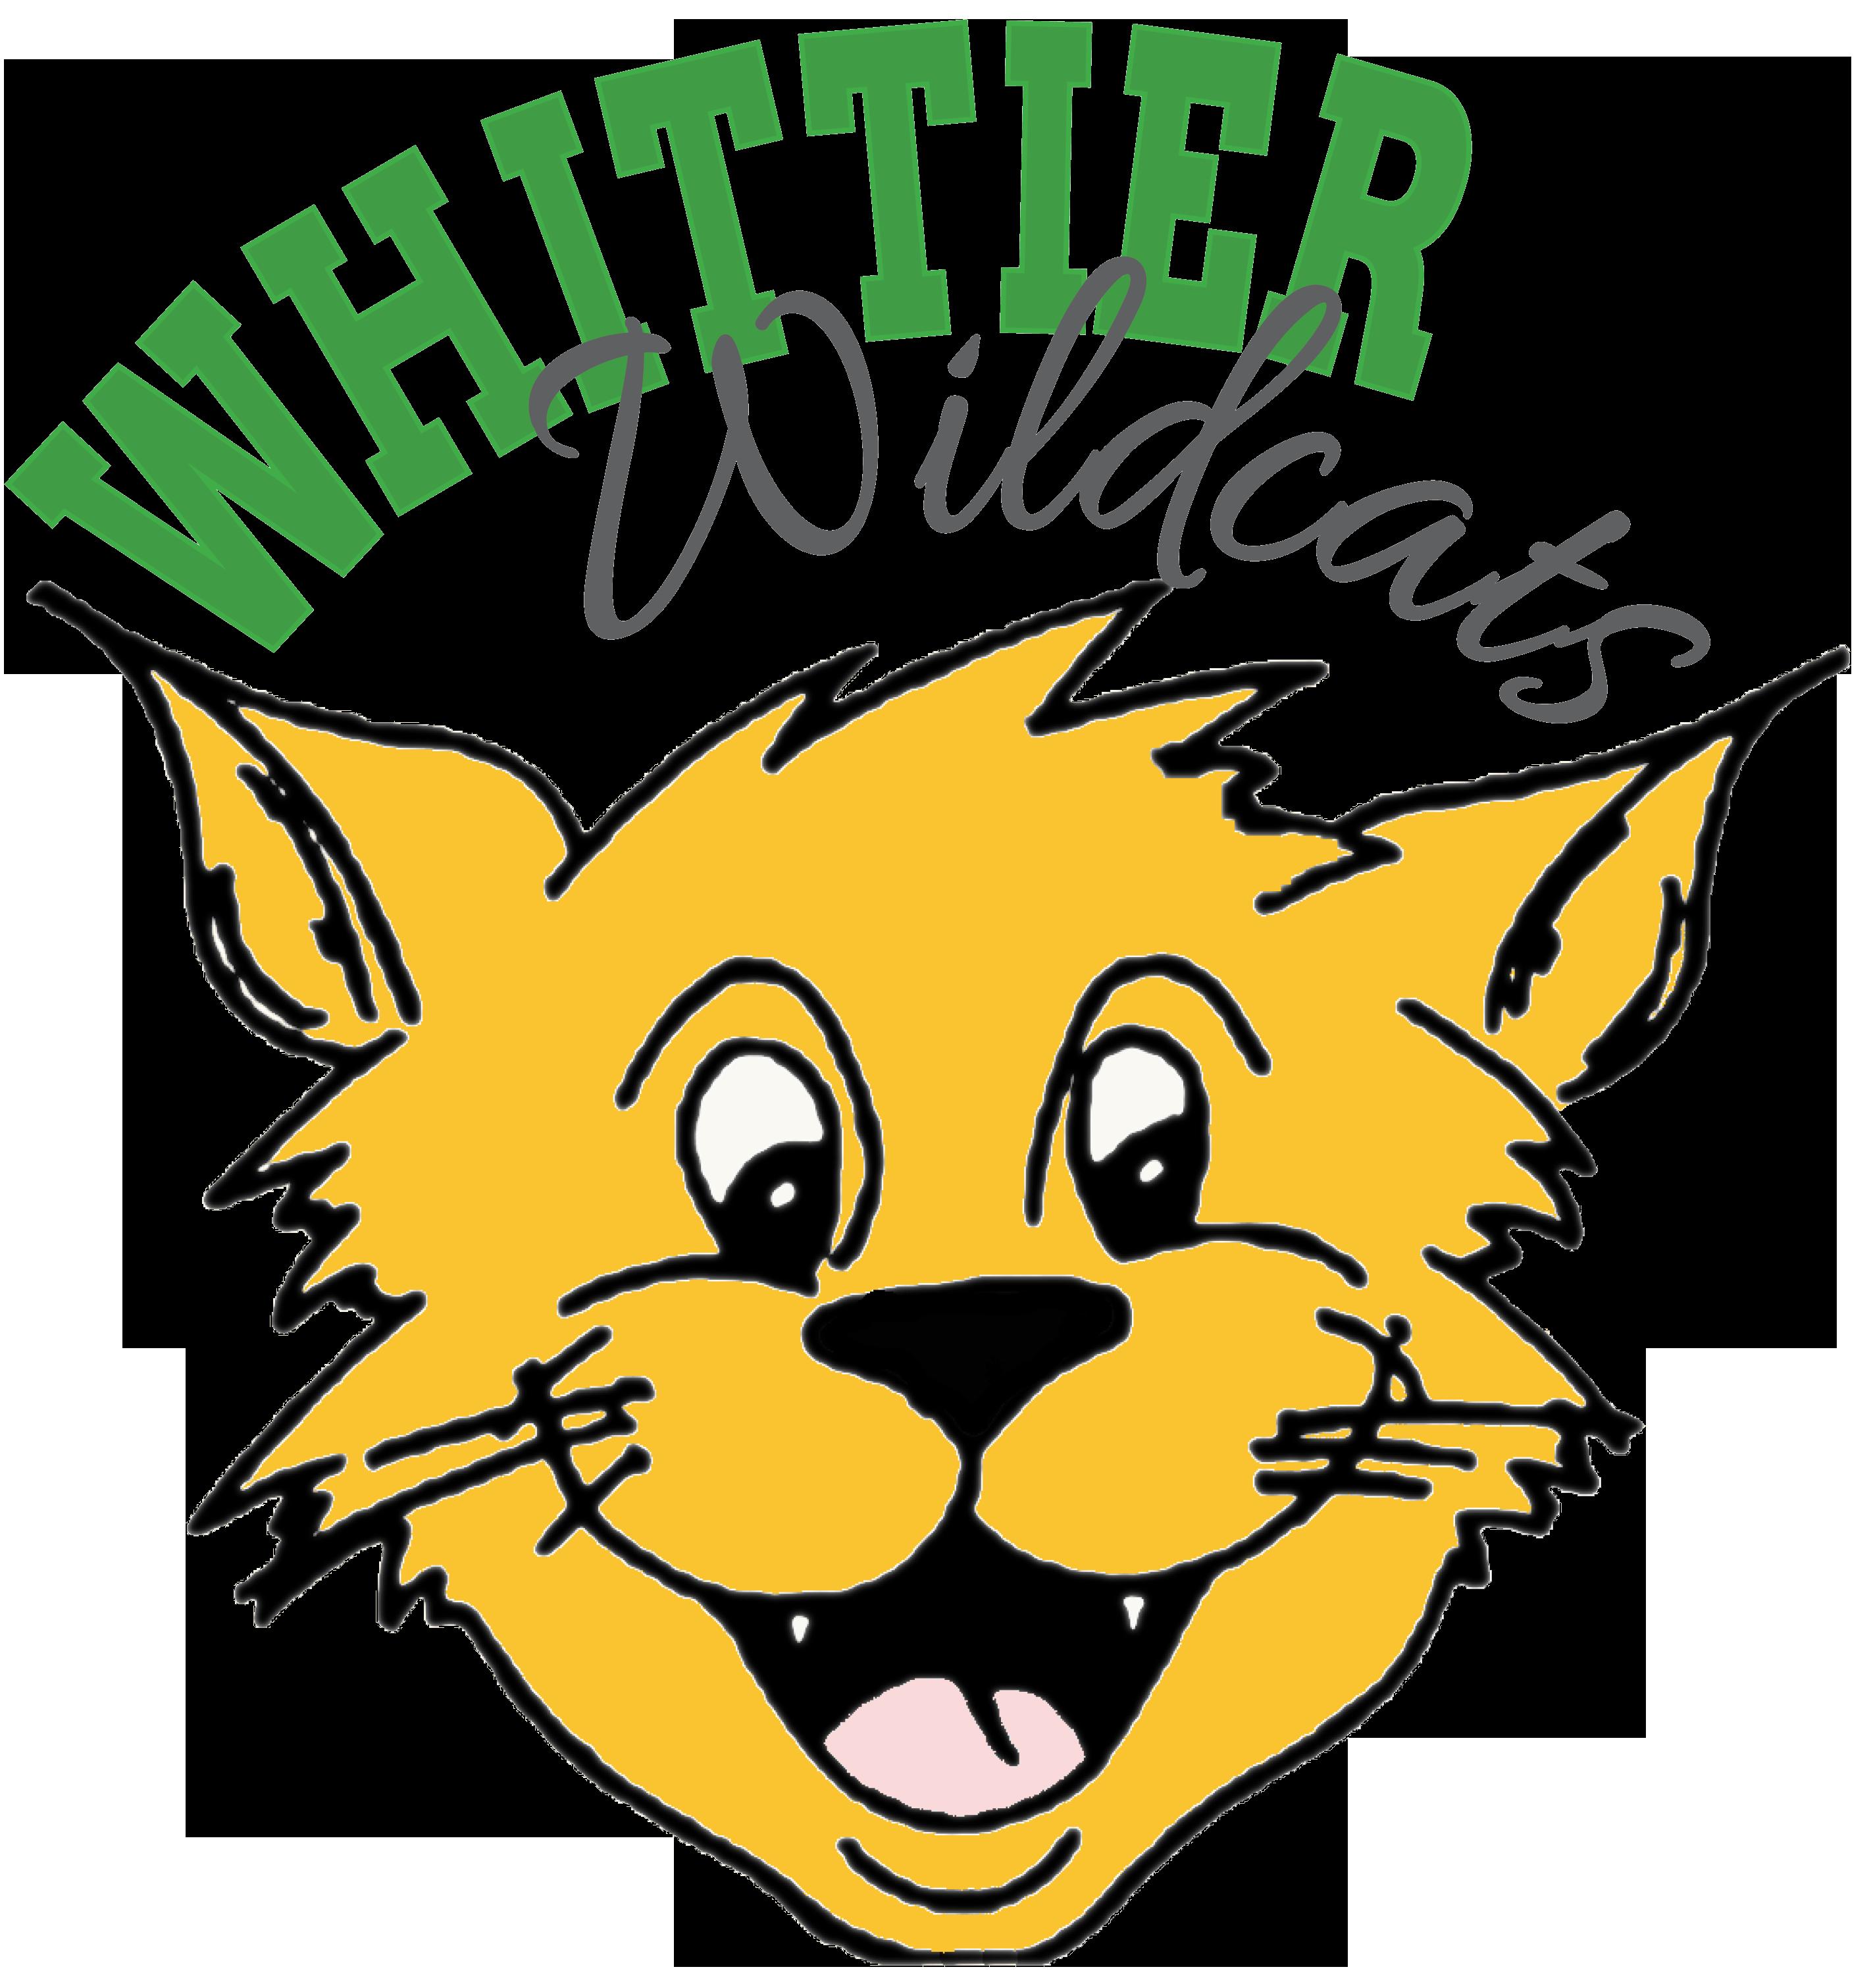 Wildcat clipart whitney. Whittier elementary school homepage